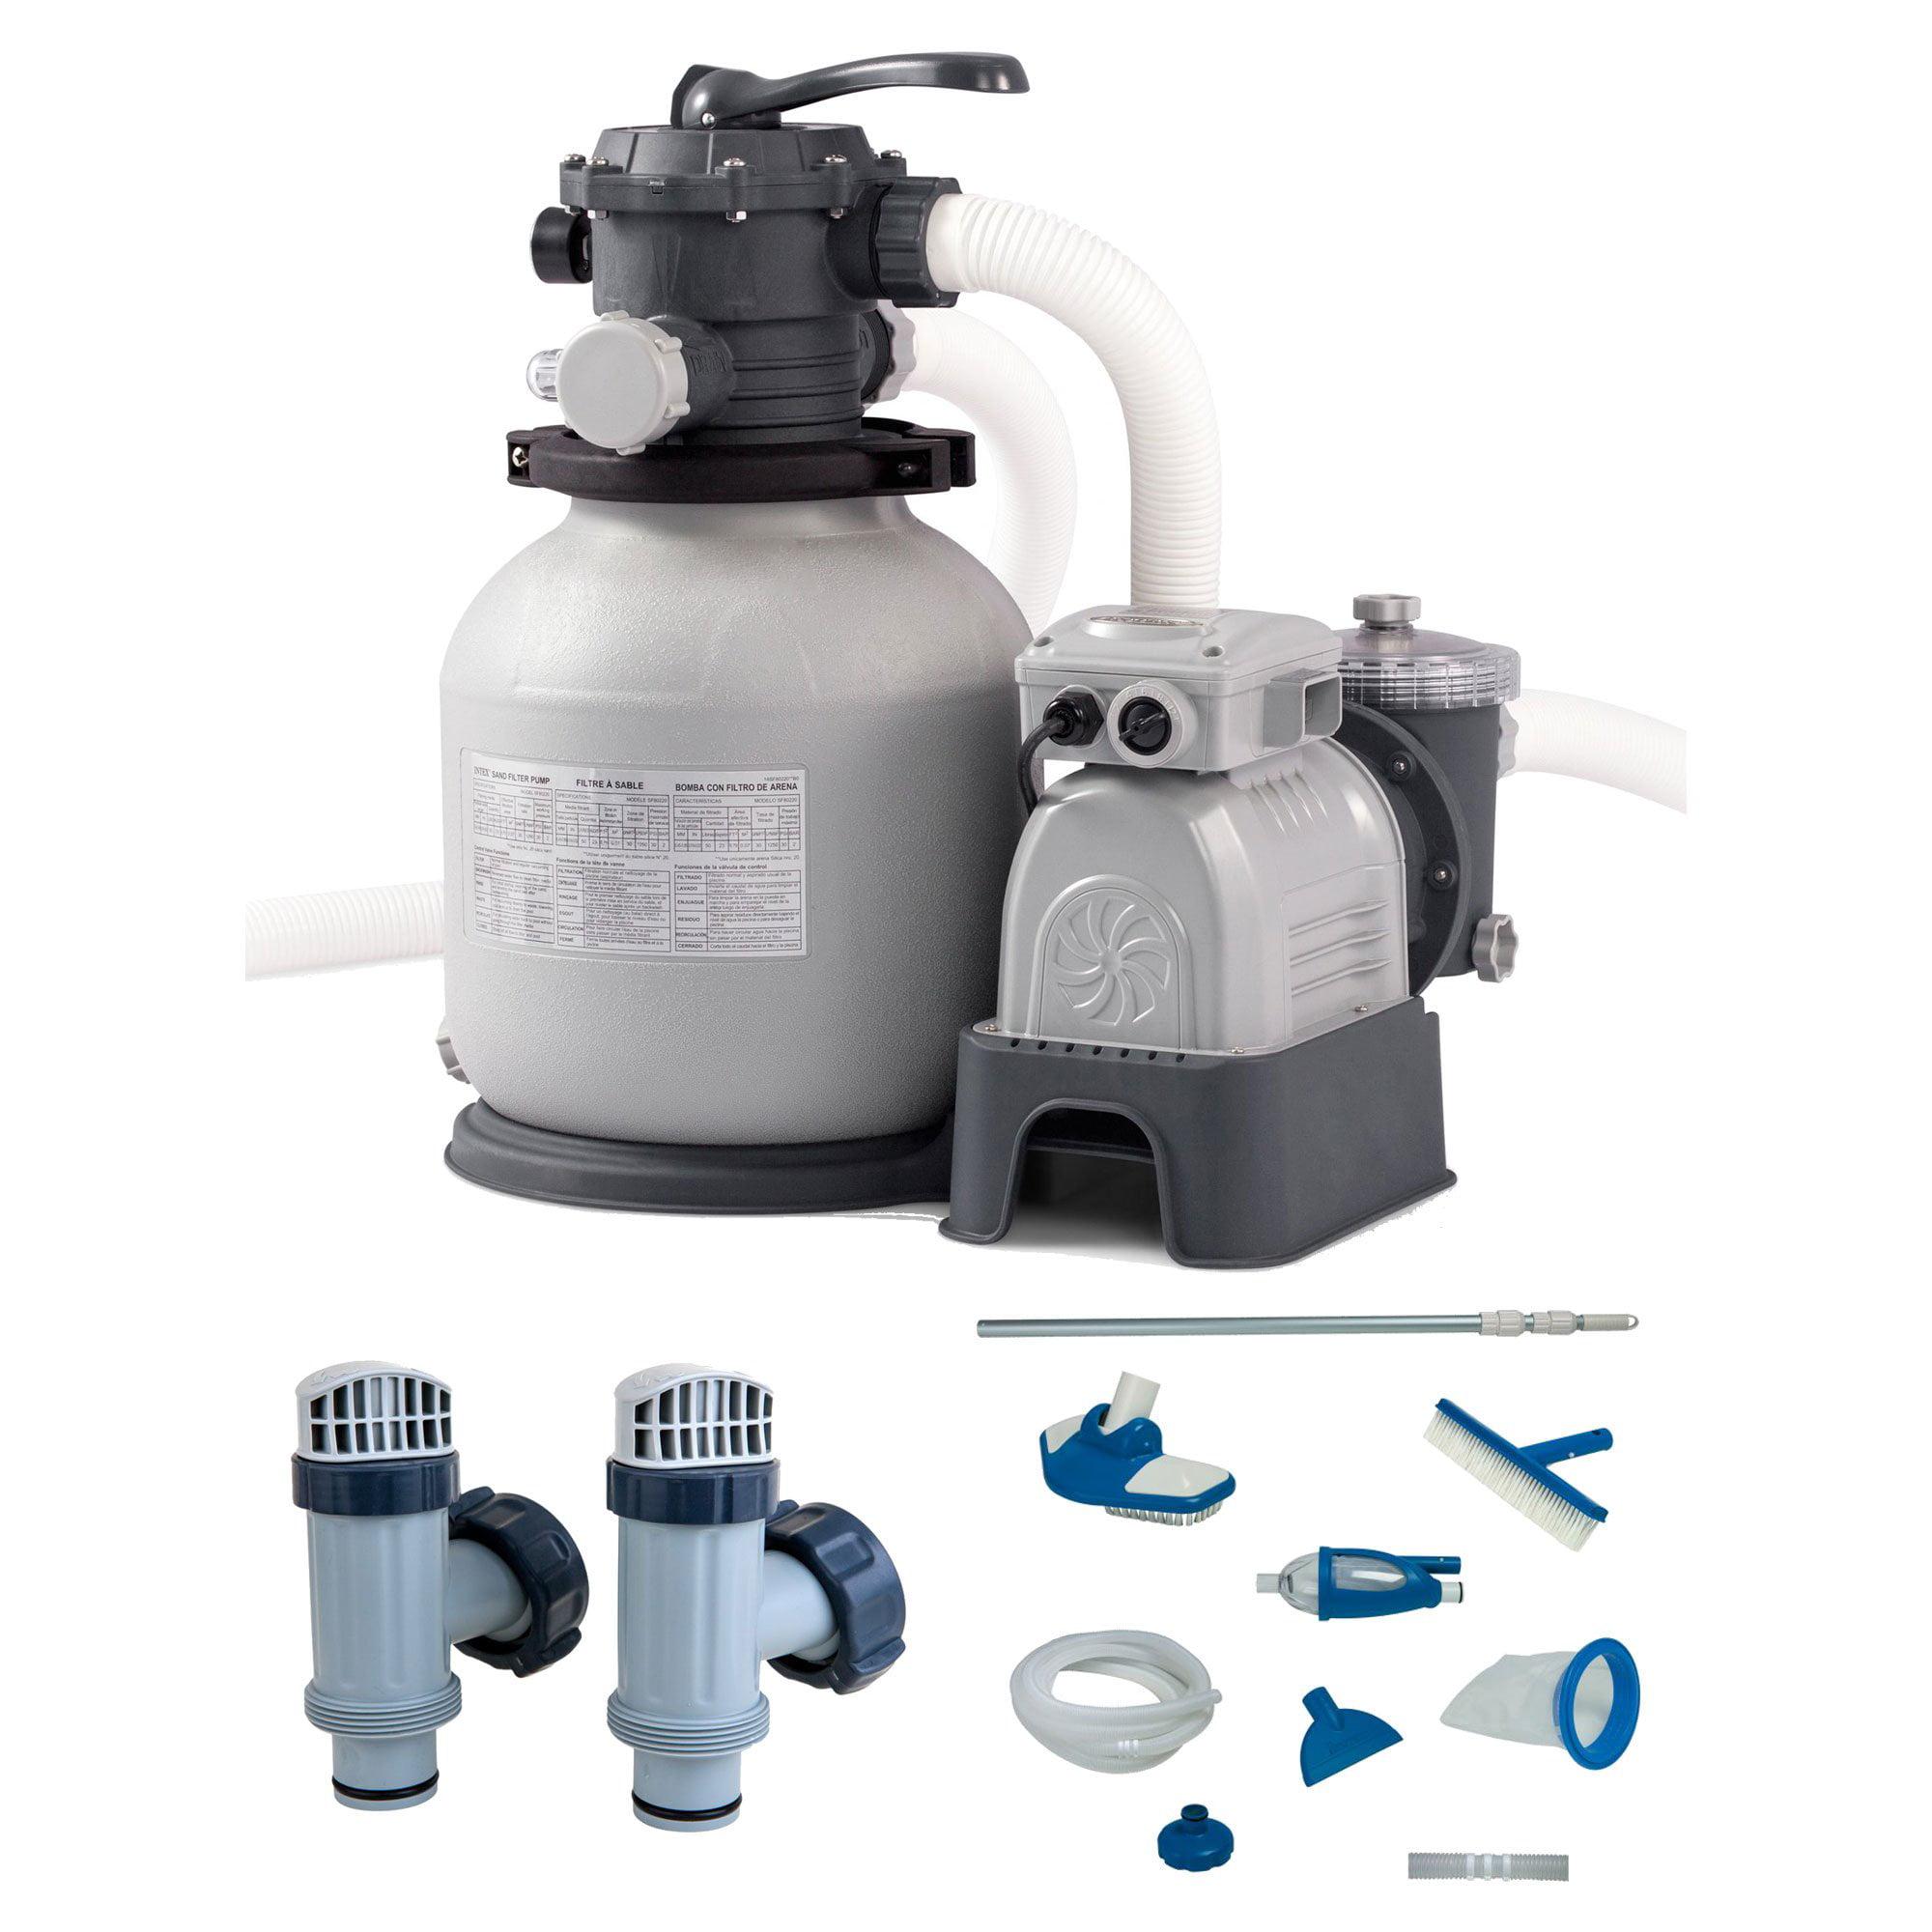 Intex Krystal Clear Sand Filter Pump & Plunger Valves (2 Pack) & Maintenance Kit